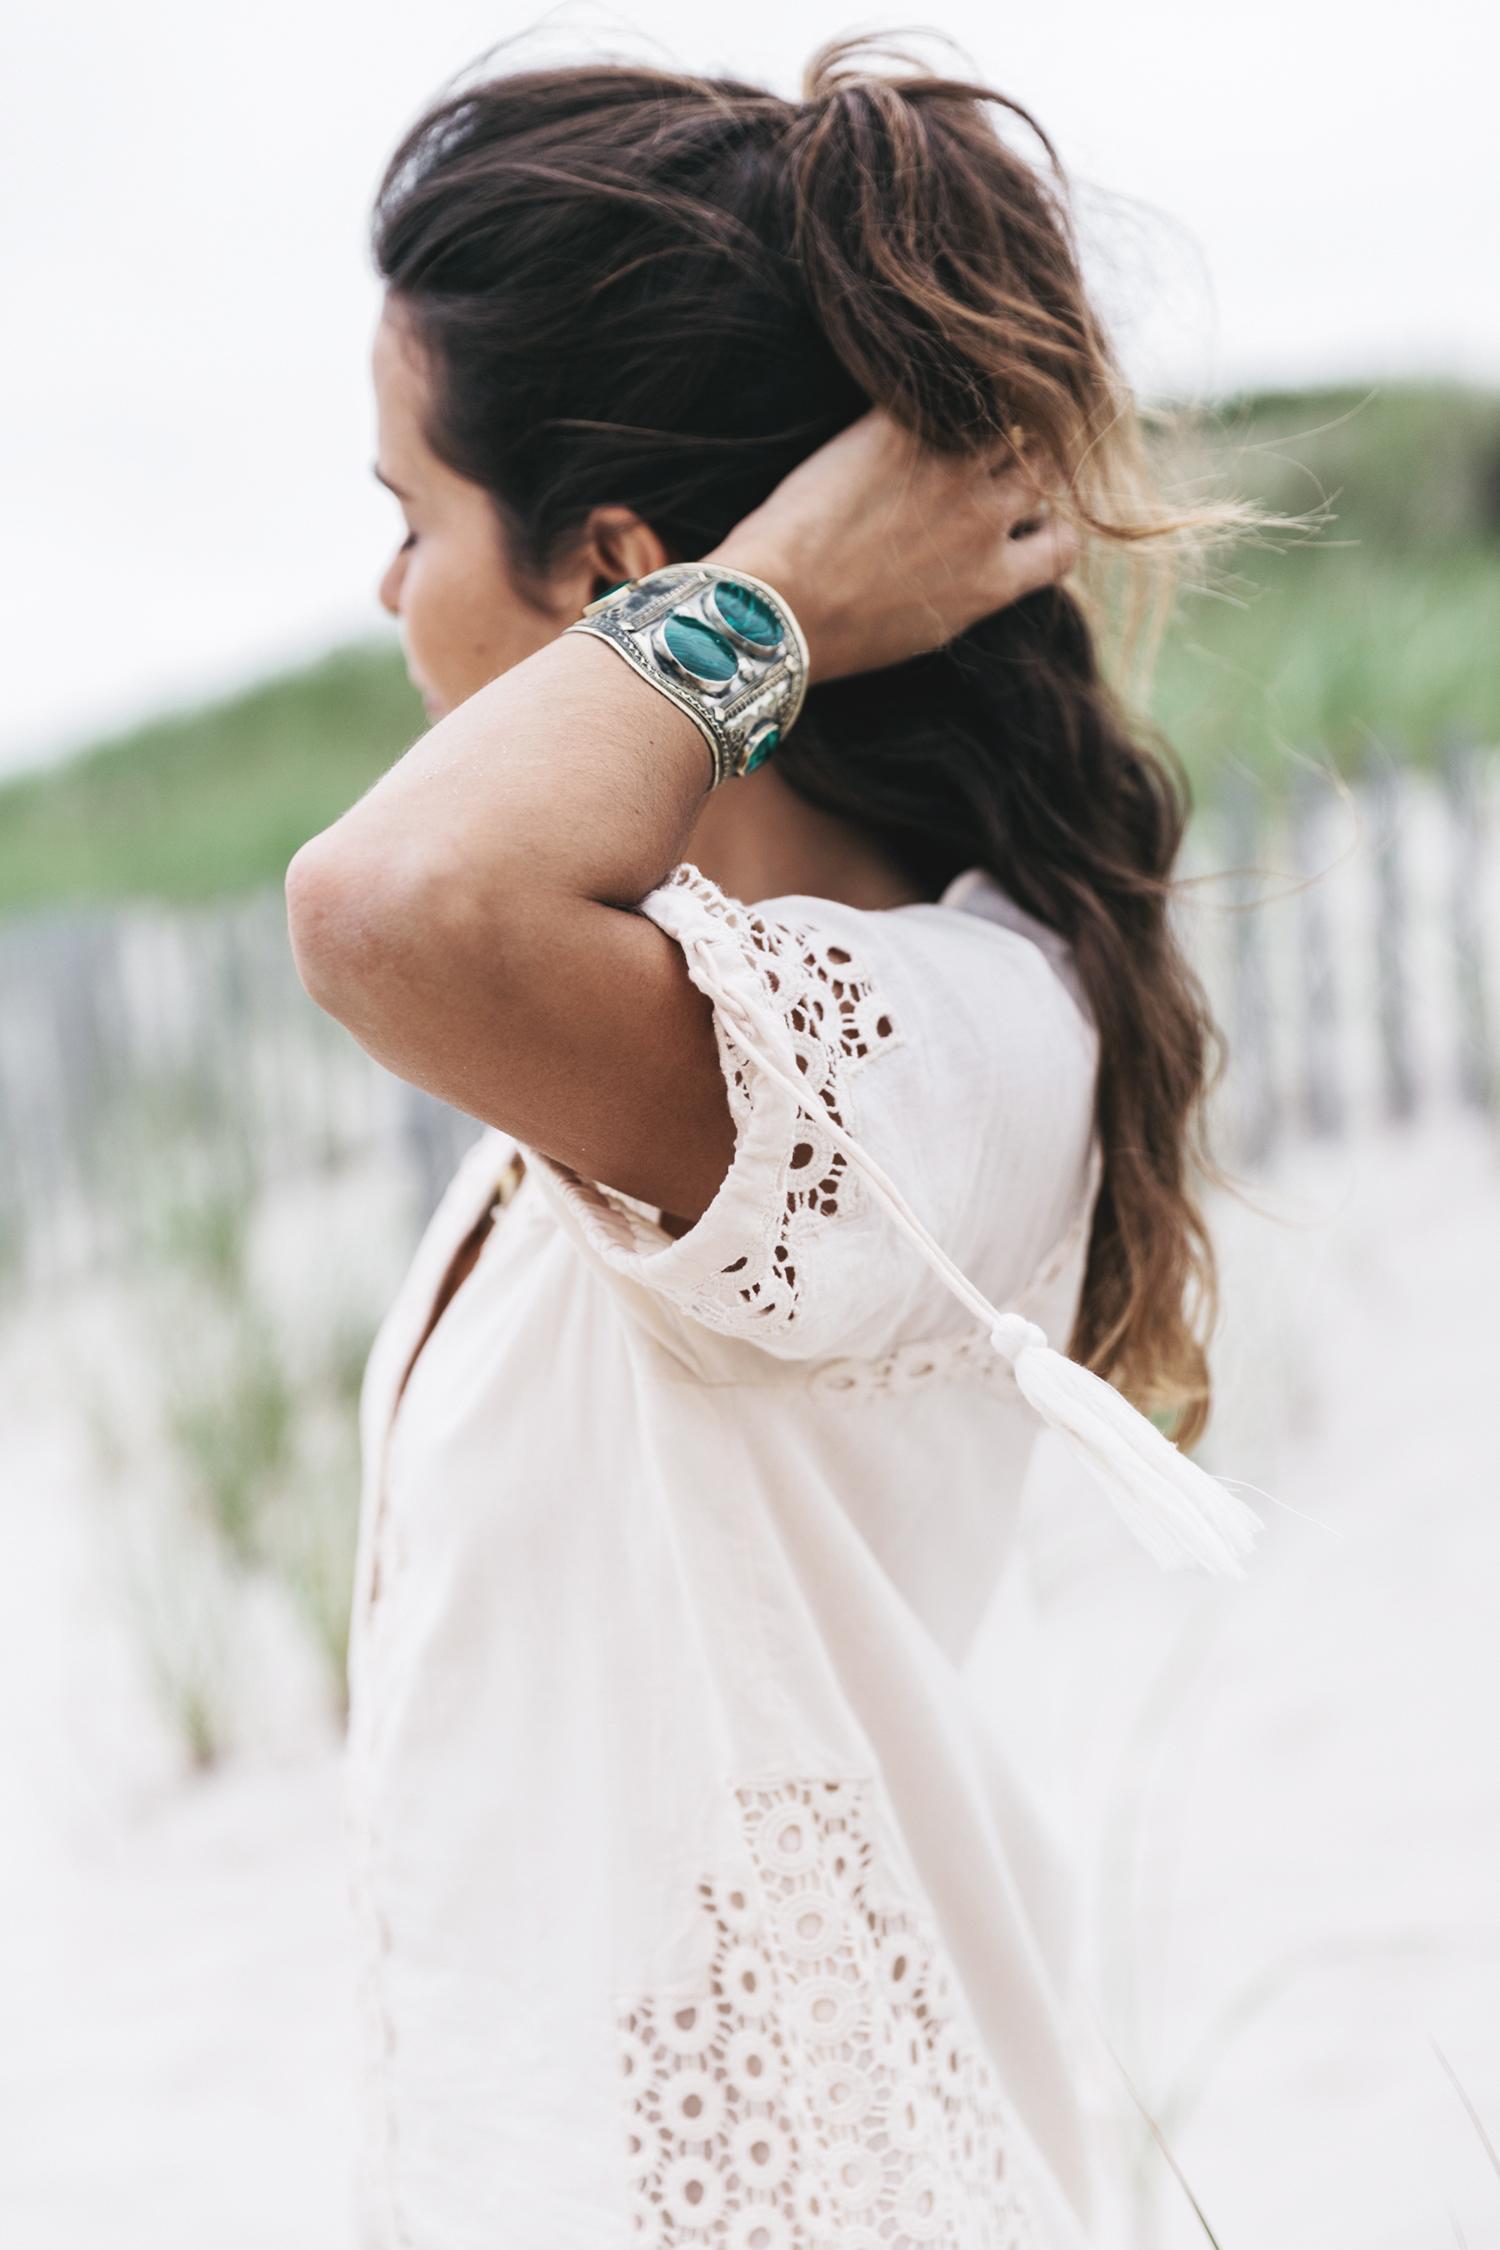 Revolve_in_The_Hamptons-Revolve_Clothing-Collage_Vintage-Cream_Dress-Tularosa-Canotier-84